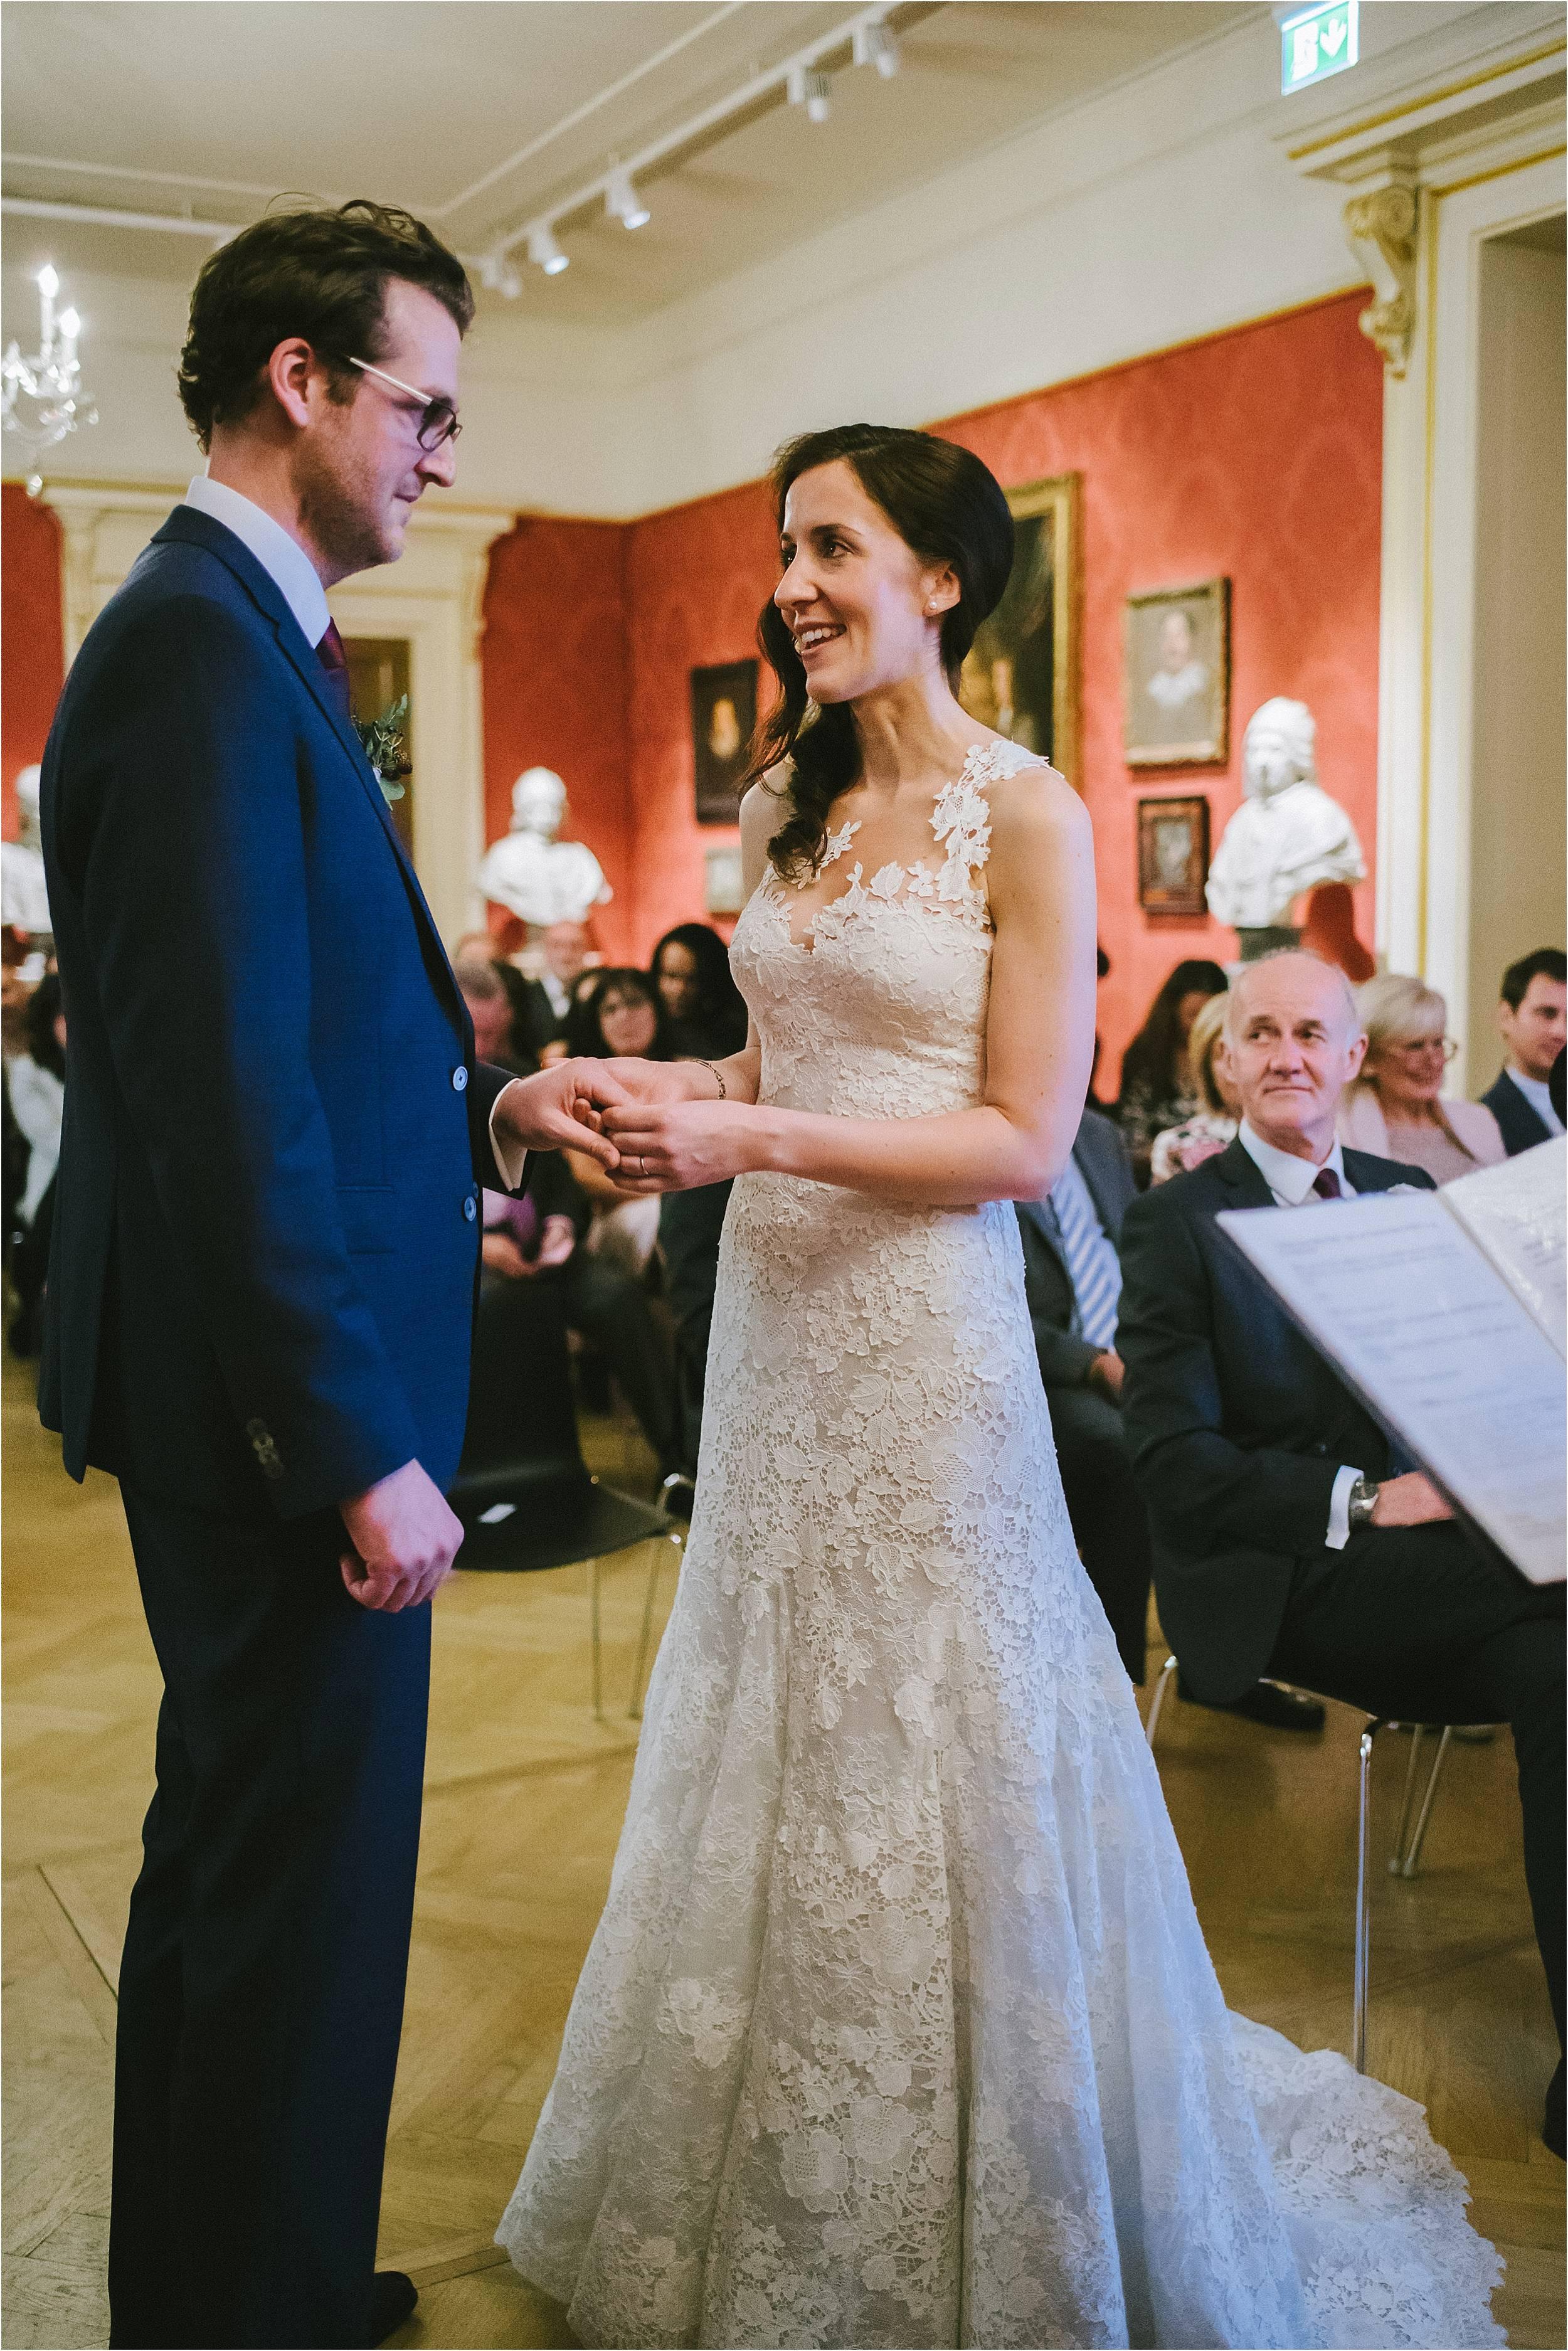 Oxford Ashmolean Museum Wedding Photography_0091.jpg